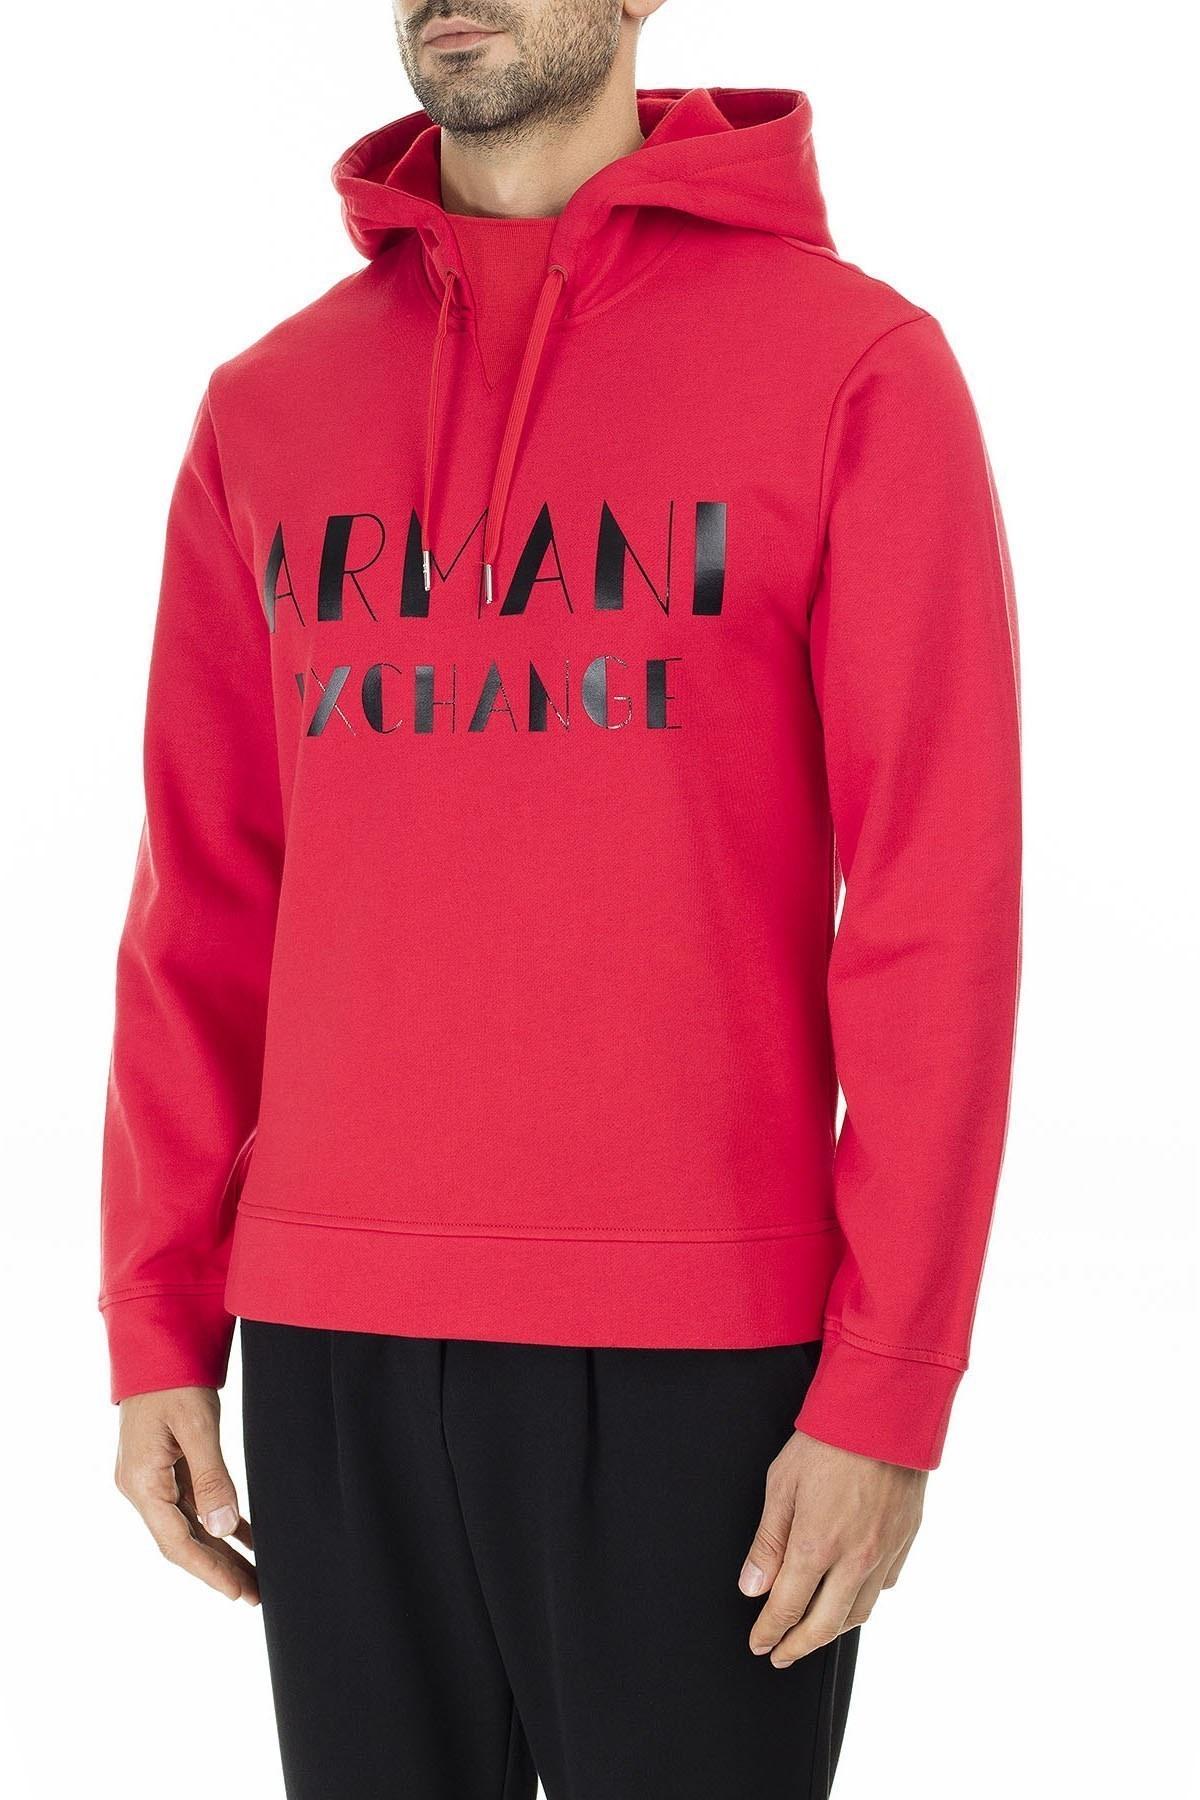 Armani Exchange Baskılı Pamuklu Kapüşonlu Erkek Sweat 6GZMBP ZJ1PZ 1400 KIRMIZI